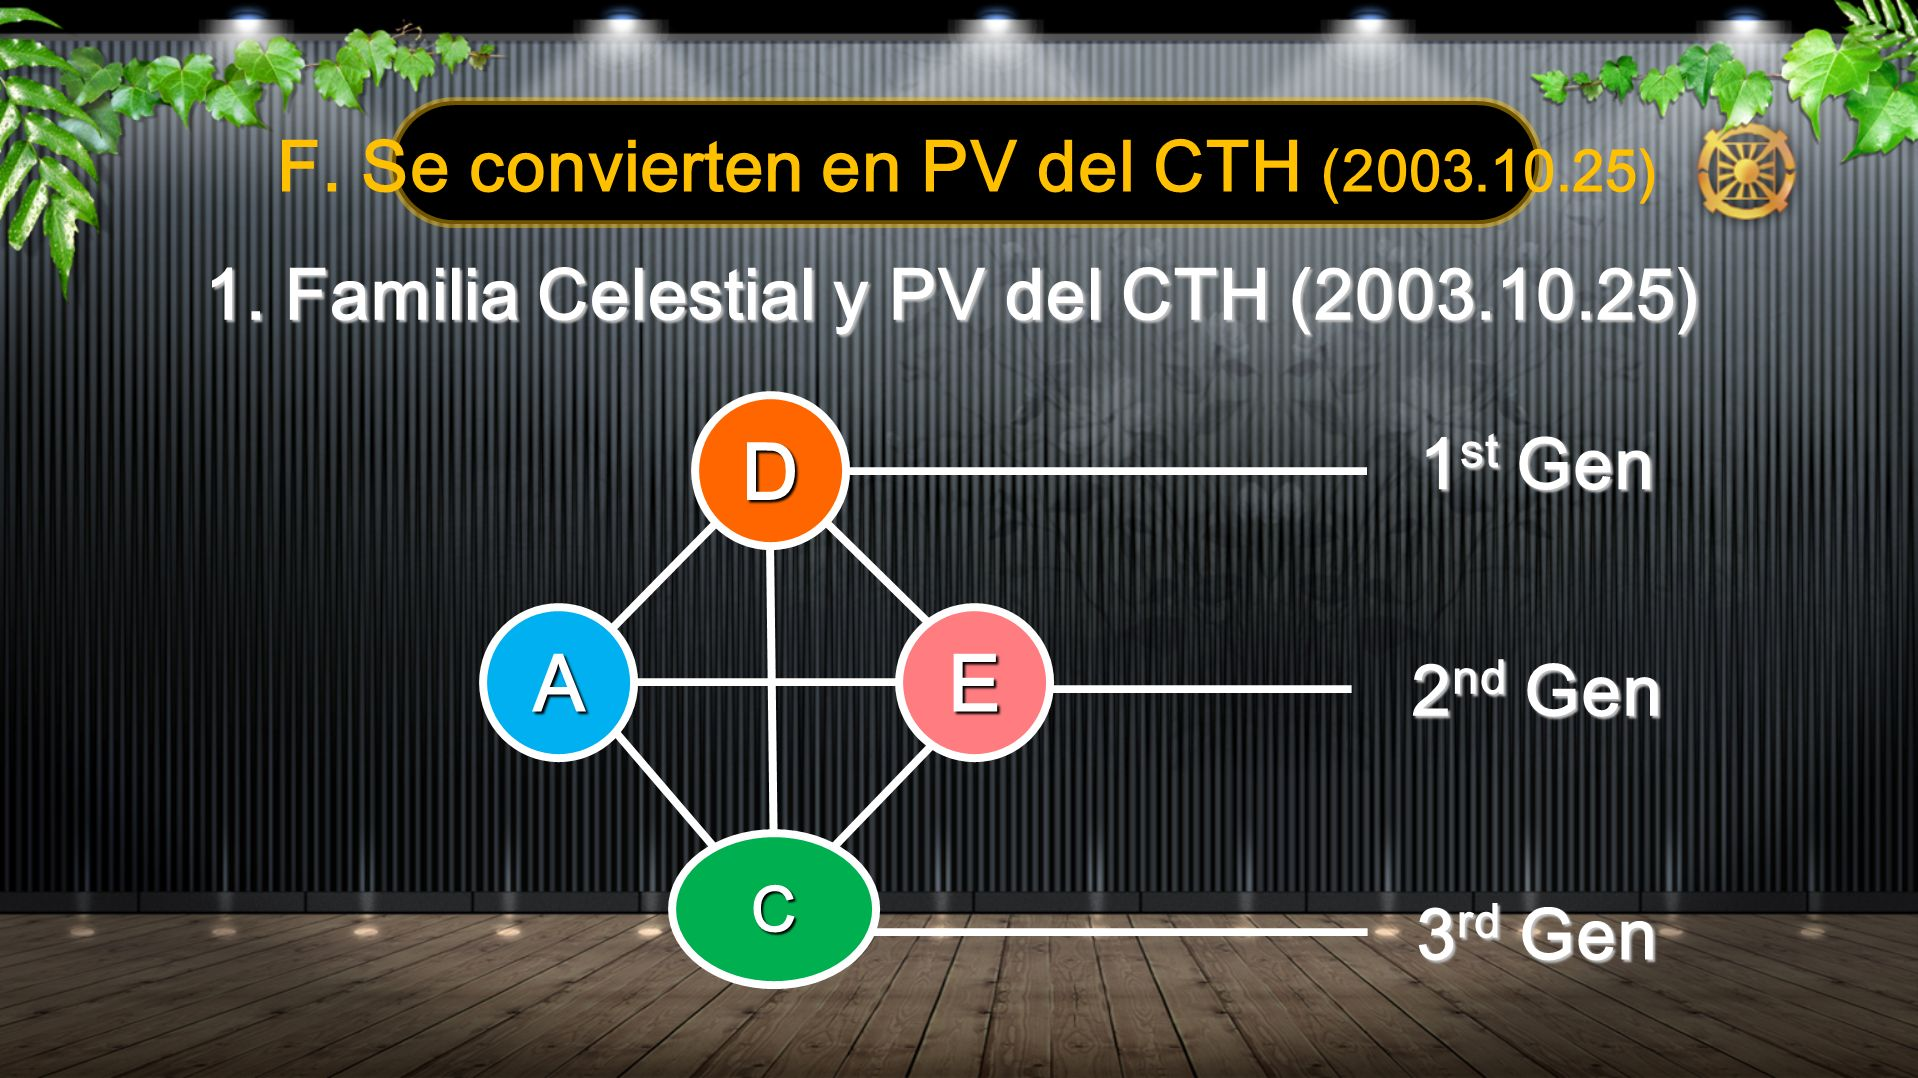 D A E F. Se convierten en PV del CTH (2003.10.25)